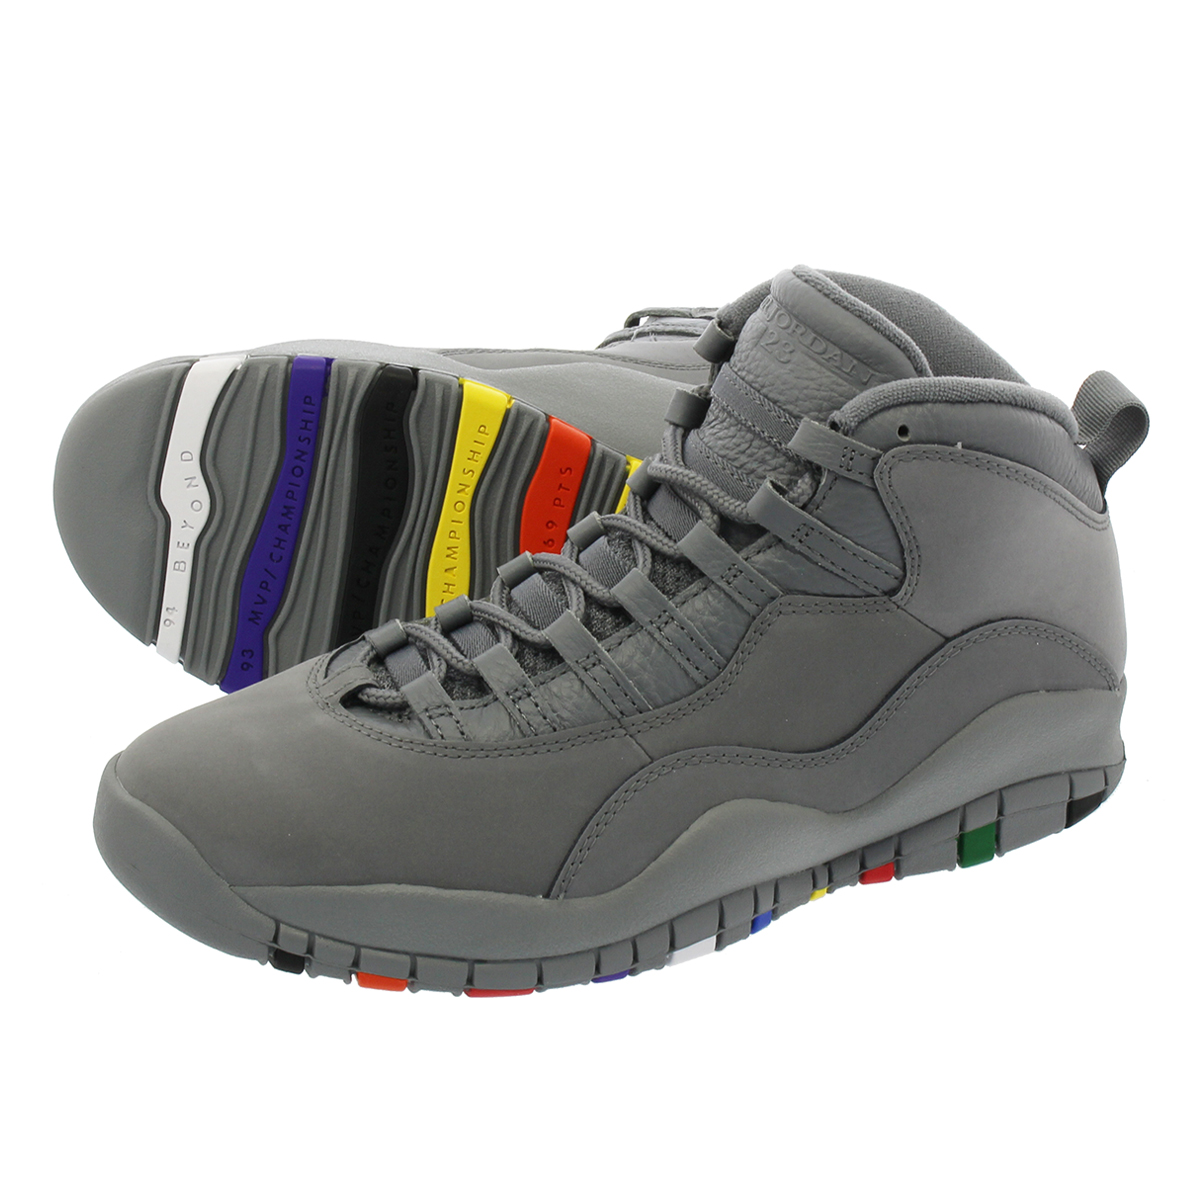 db3f20b44213 NIKE AIR JORDAN 10 RETRO Nike Air Jordan 10 nostalgic COOL GREY COOL GREY  WHITE